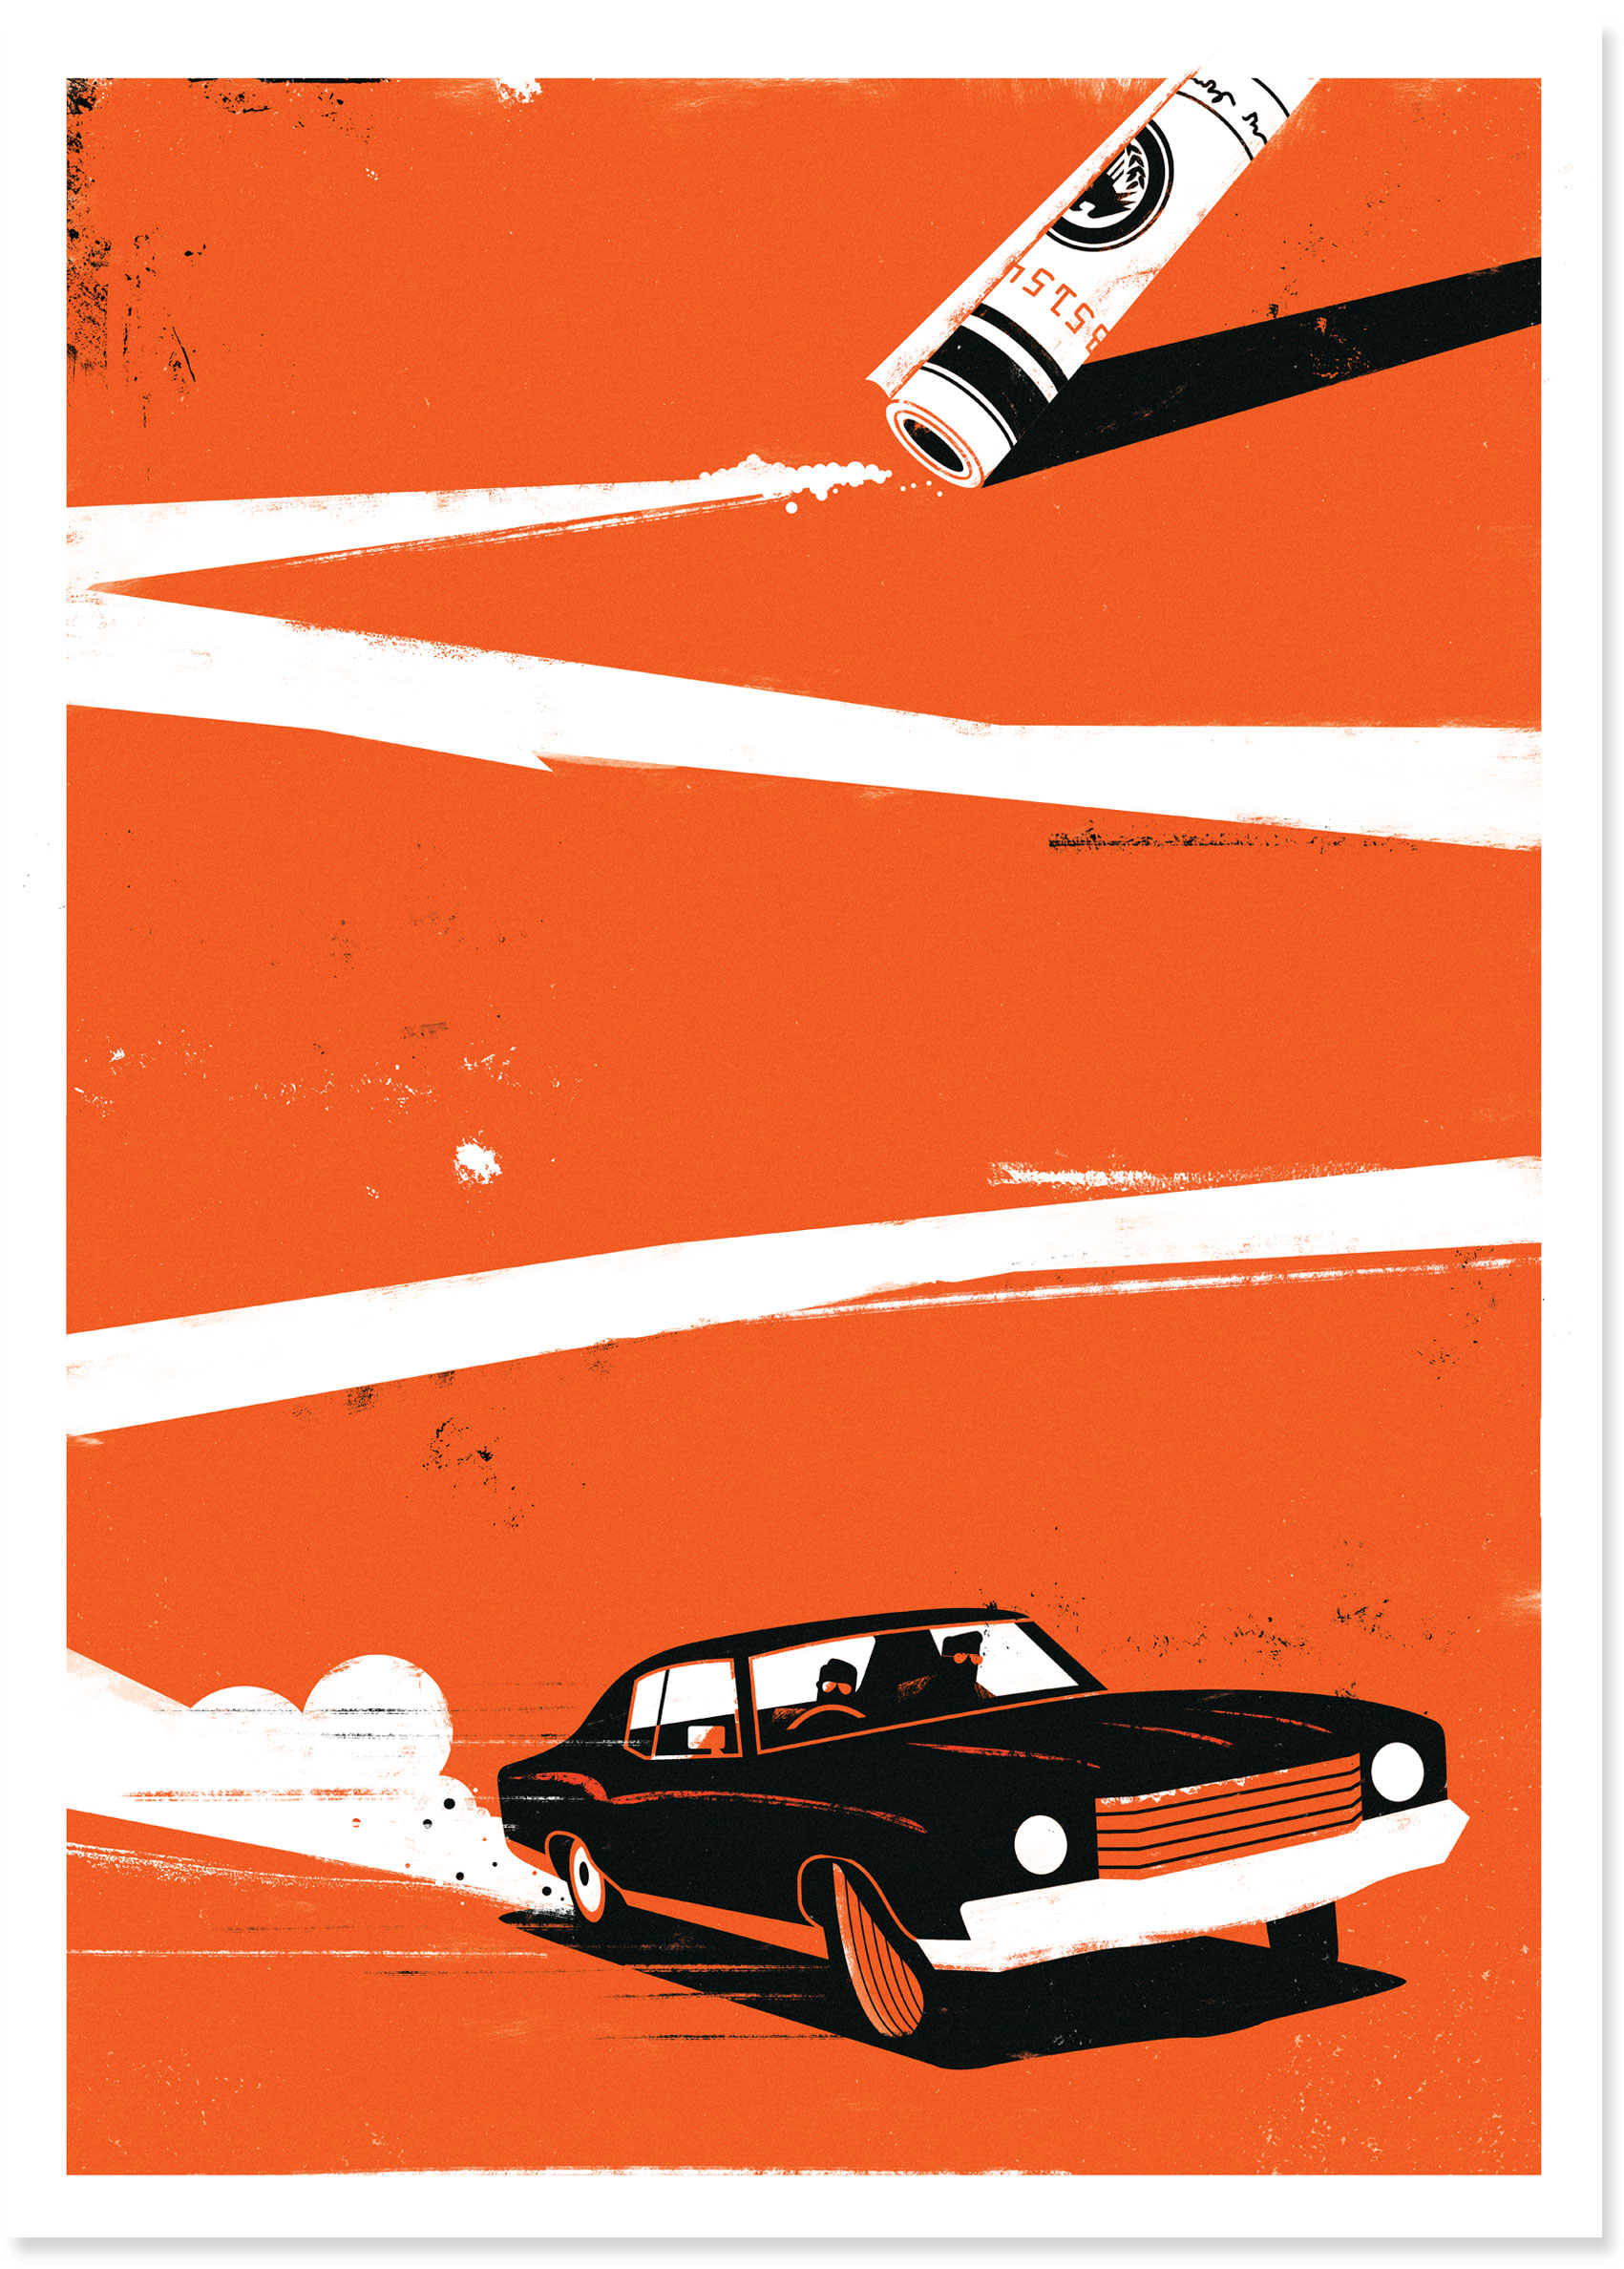 dale edwin murray freelance illustrator delve war on everyone movie film print poster illustration